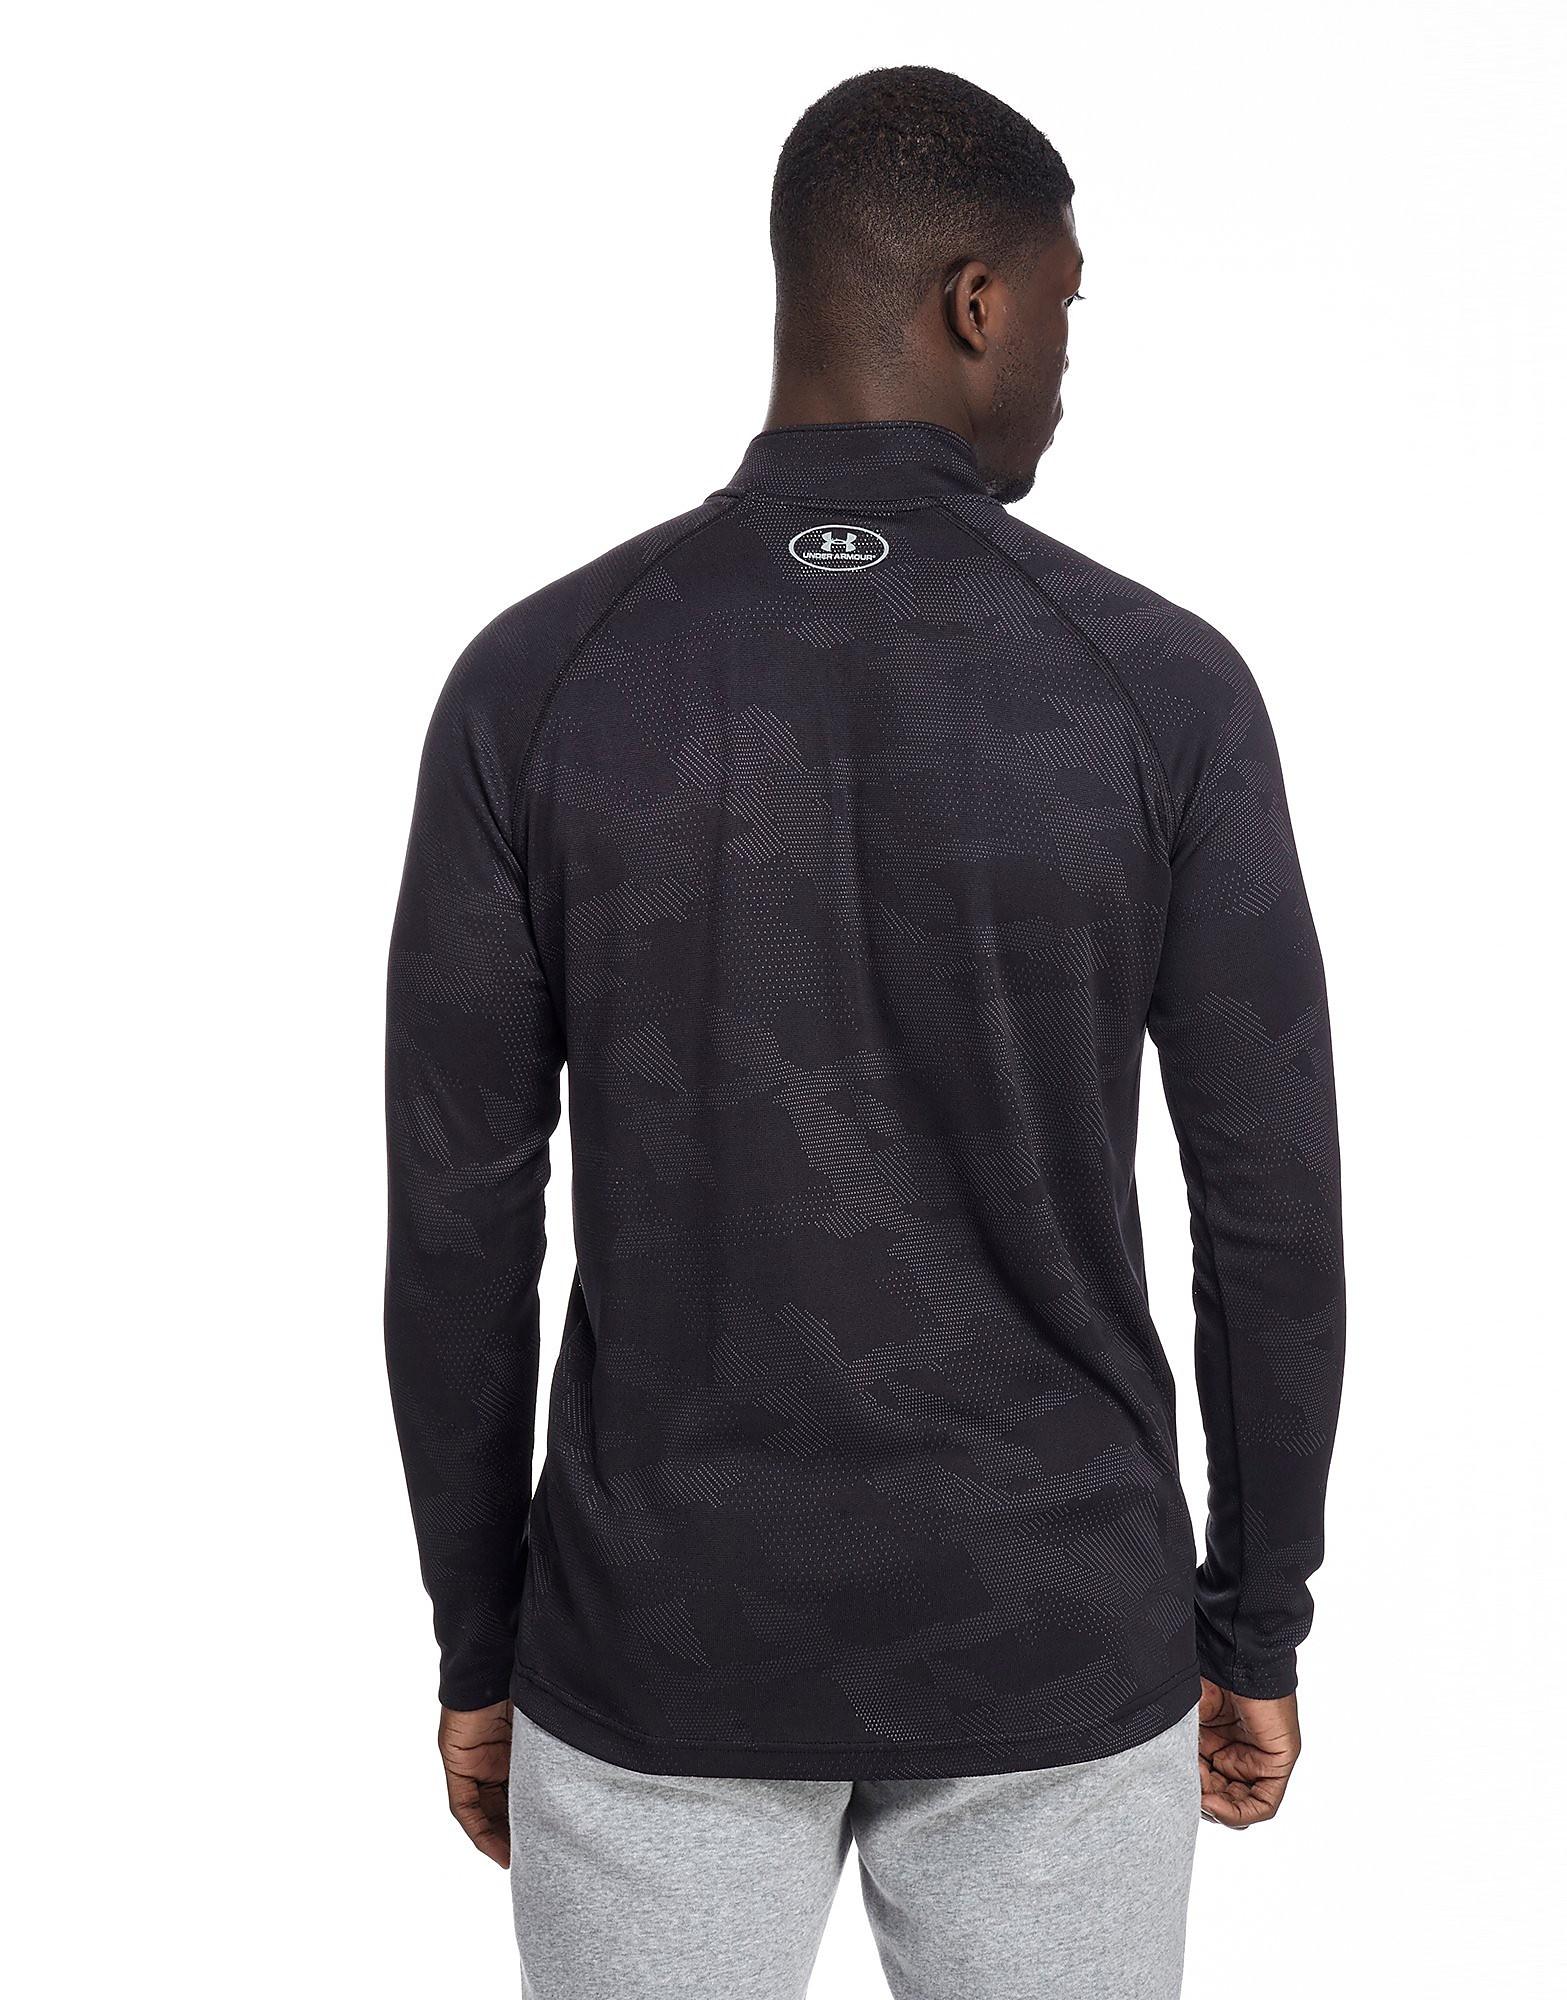 Under Armour Tech Jacquard-jakke med kvart lynlås